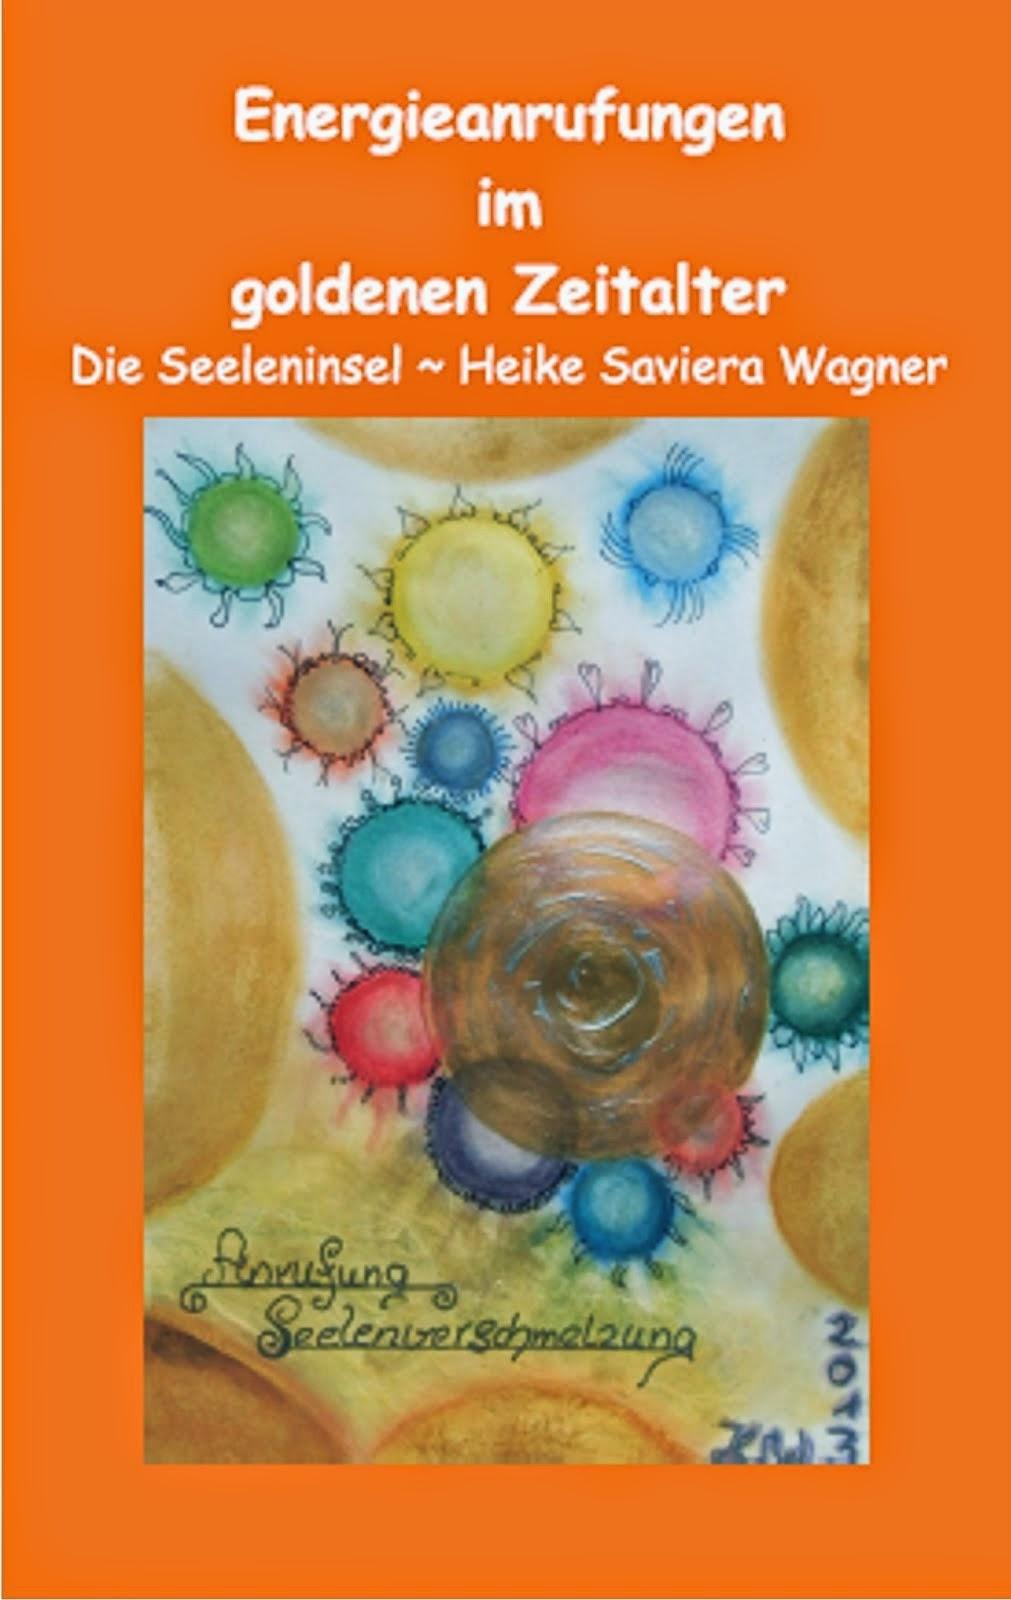 ♥ Das 1. Seeleninsel-Buch ♥